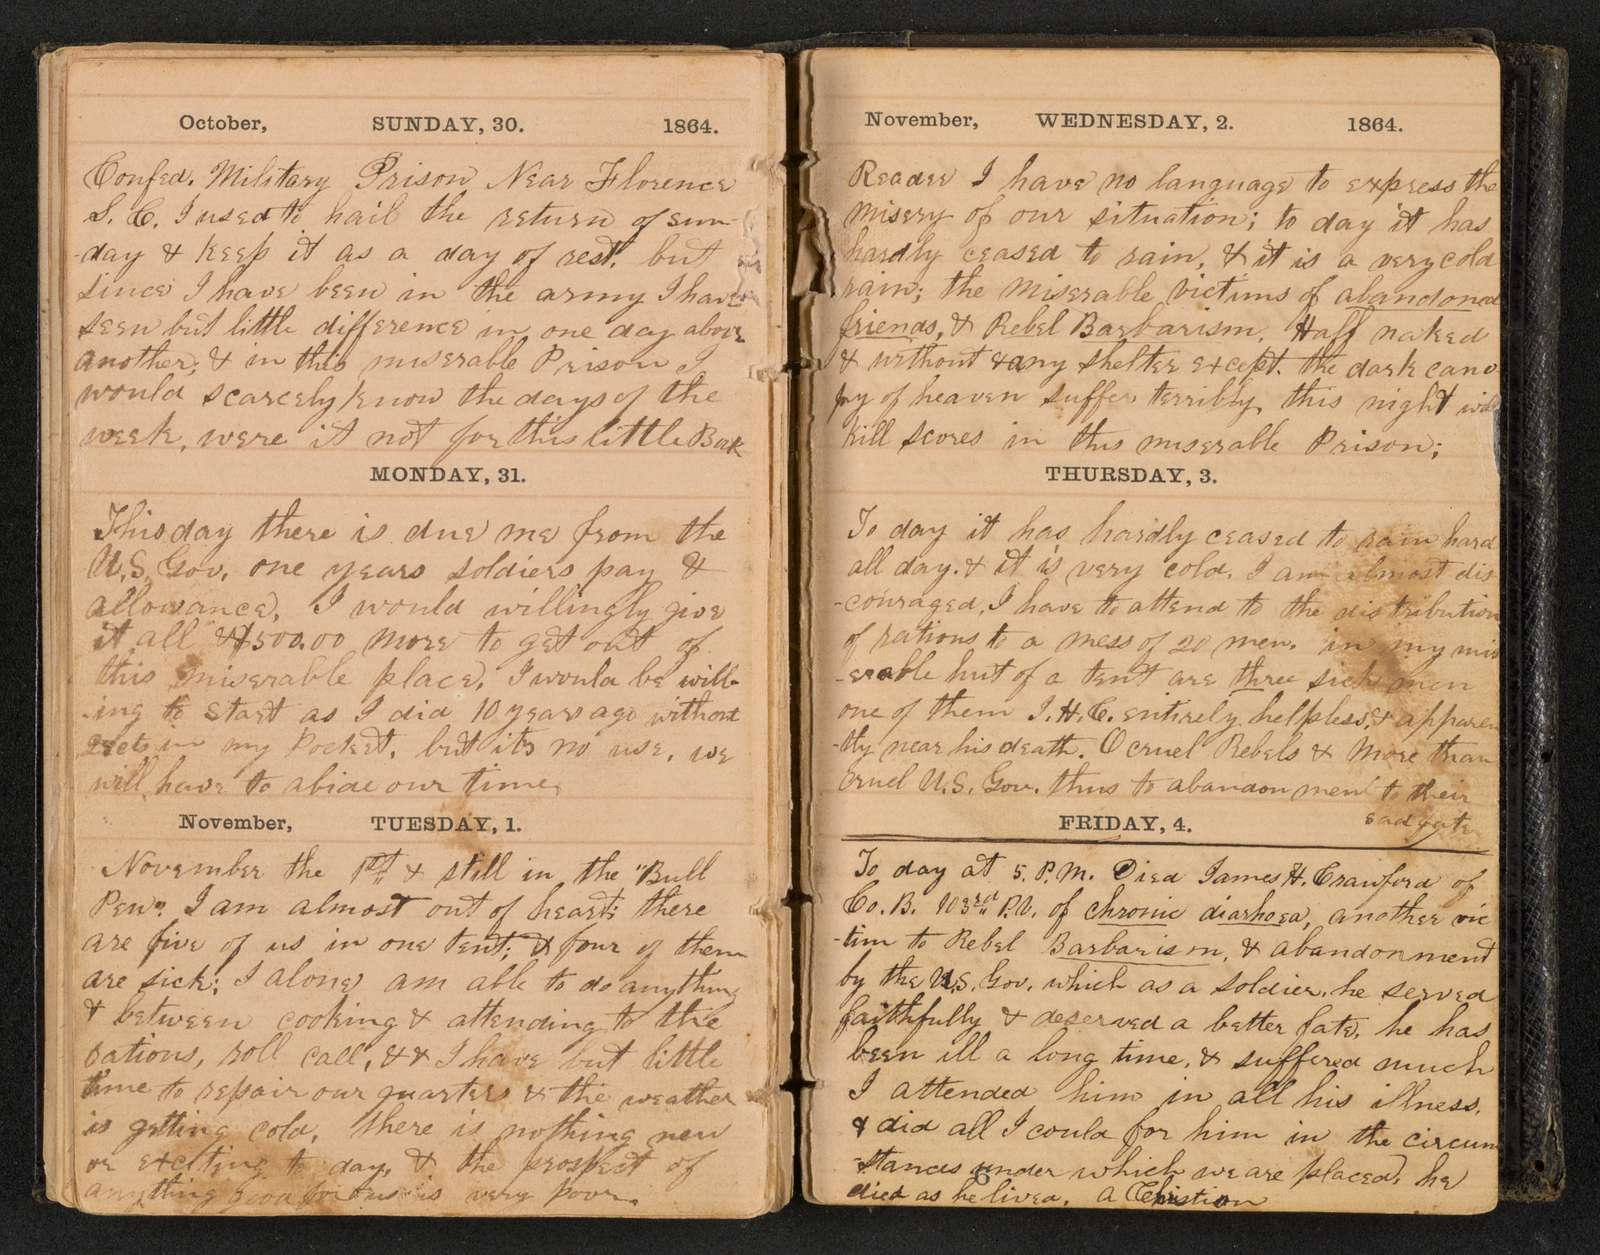 Samuel J. Gibson diary and correspondence, 1864., Diary, 1864